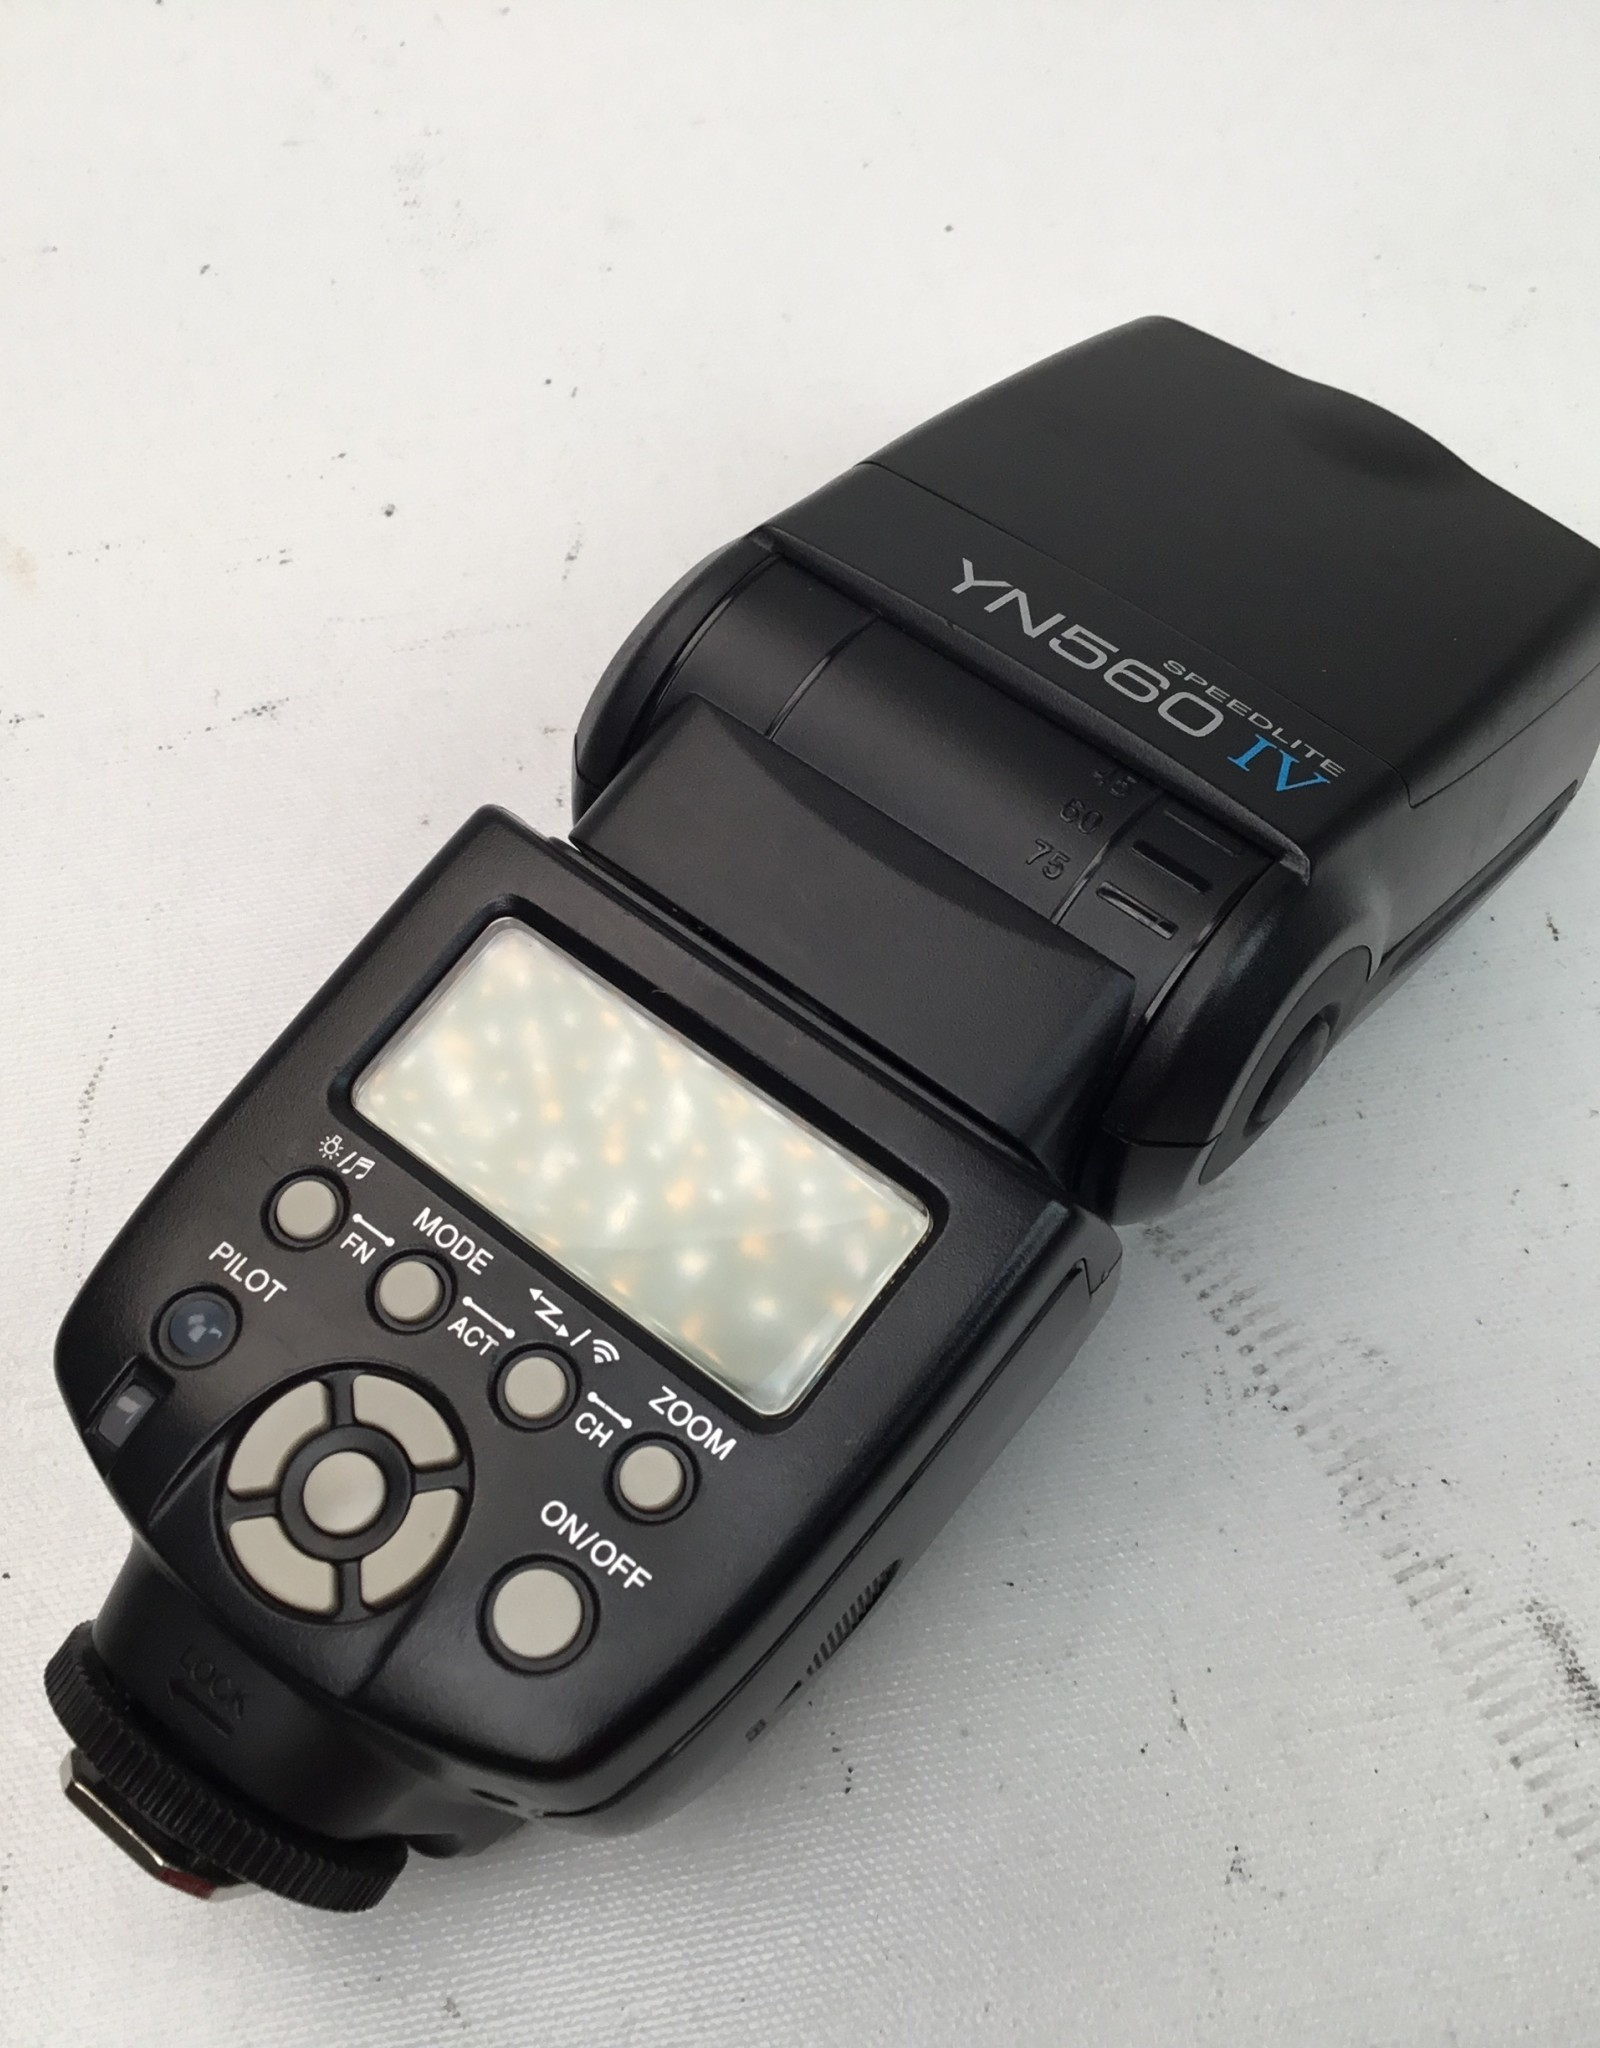 YONGNUO Yongnoa YN560 IV Speedlite Flash Used Good